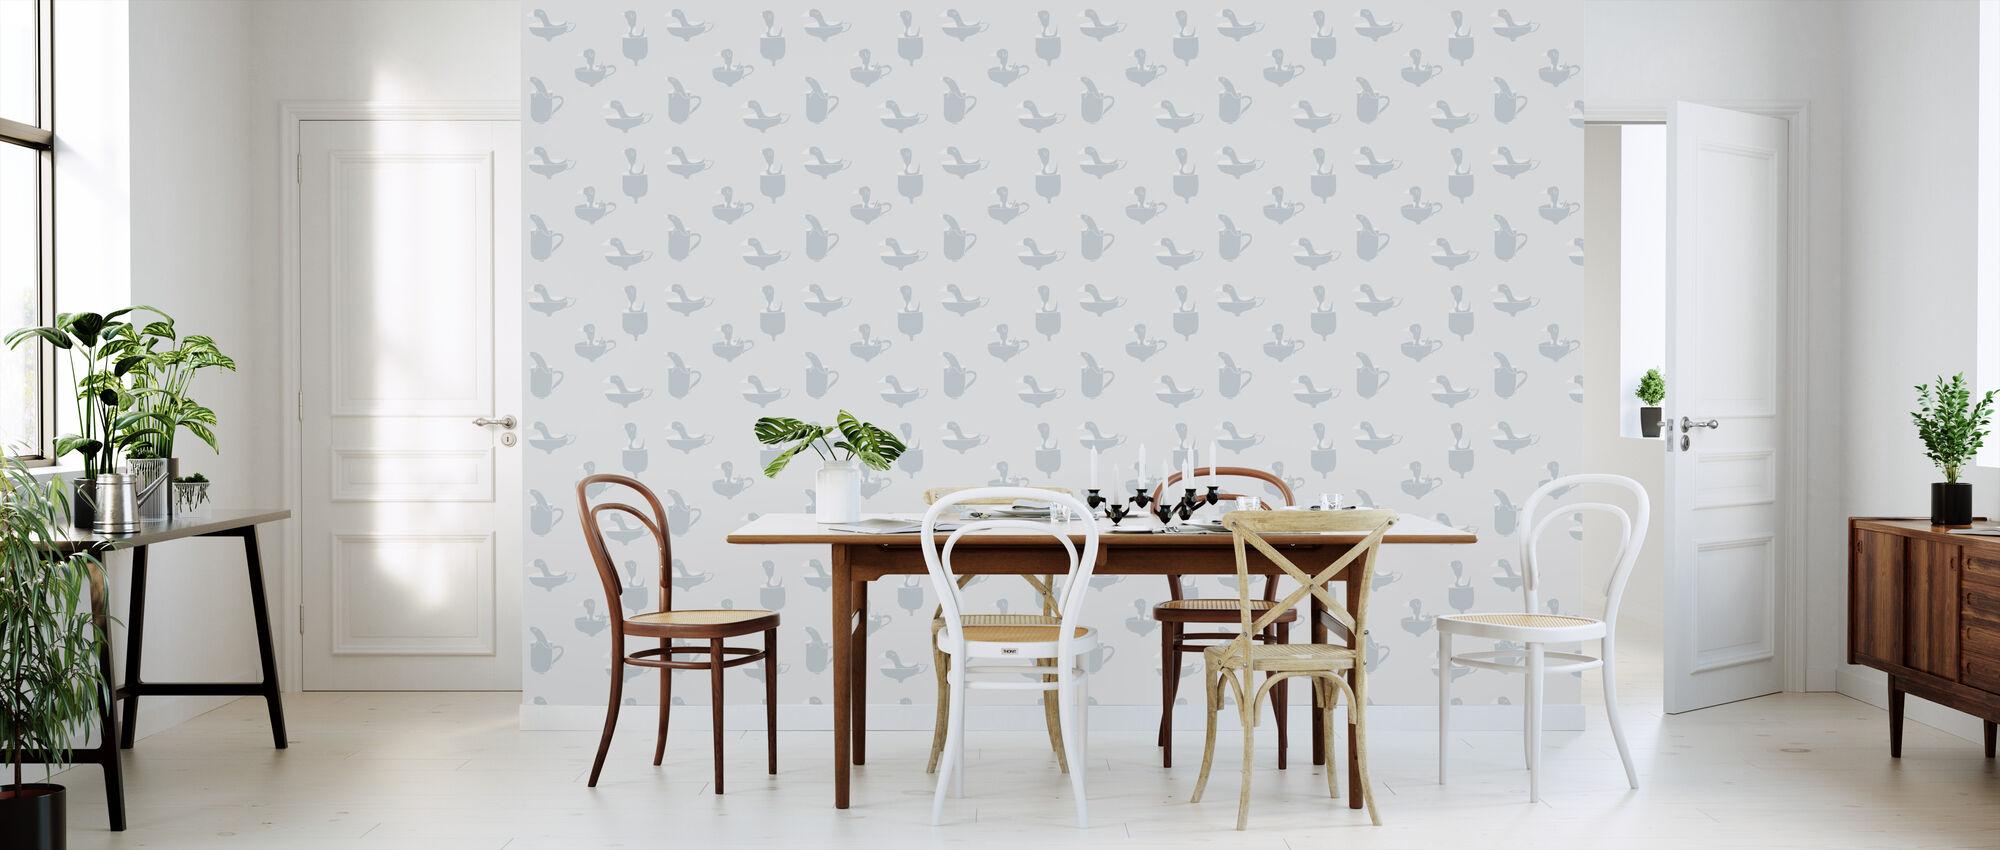 Ducks In Cups - Wallpaper - Kitchen